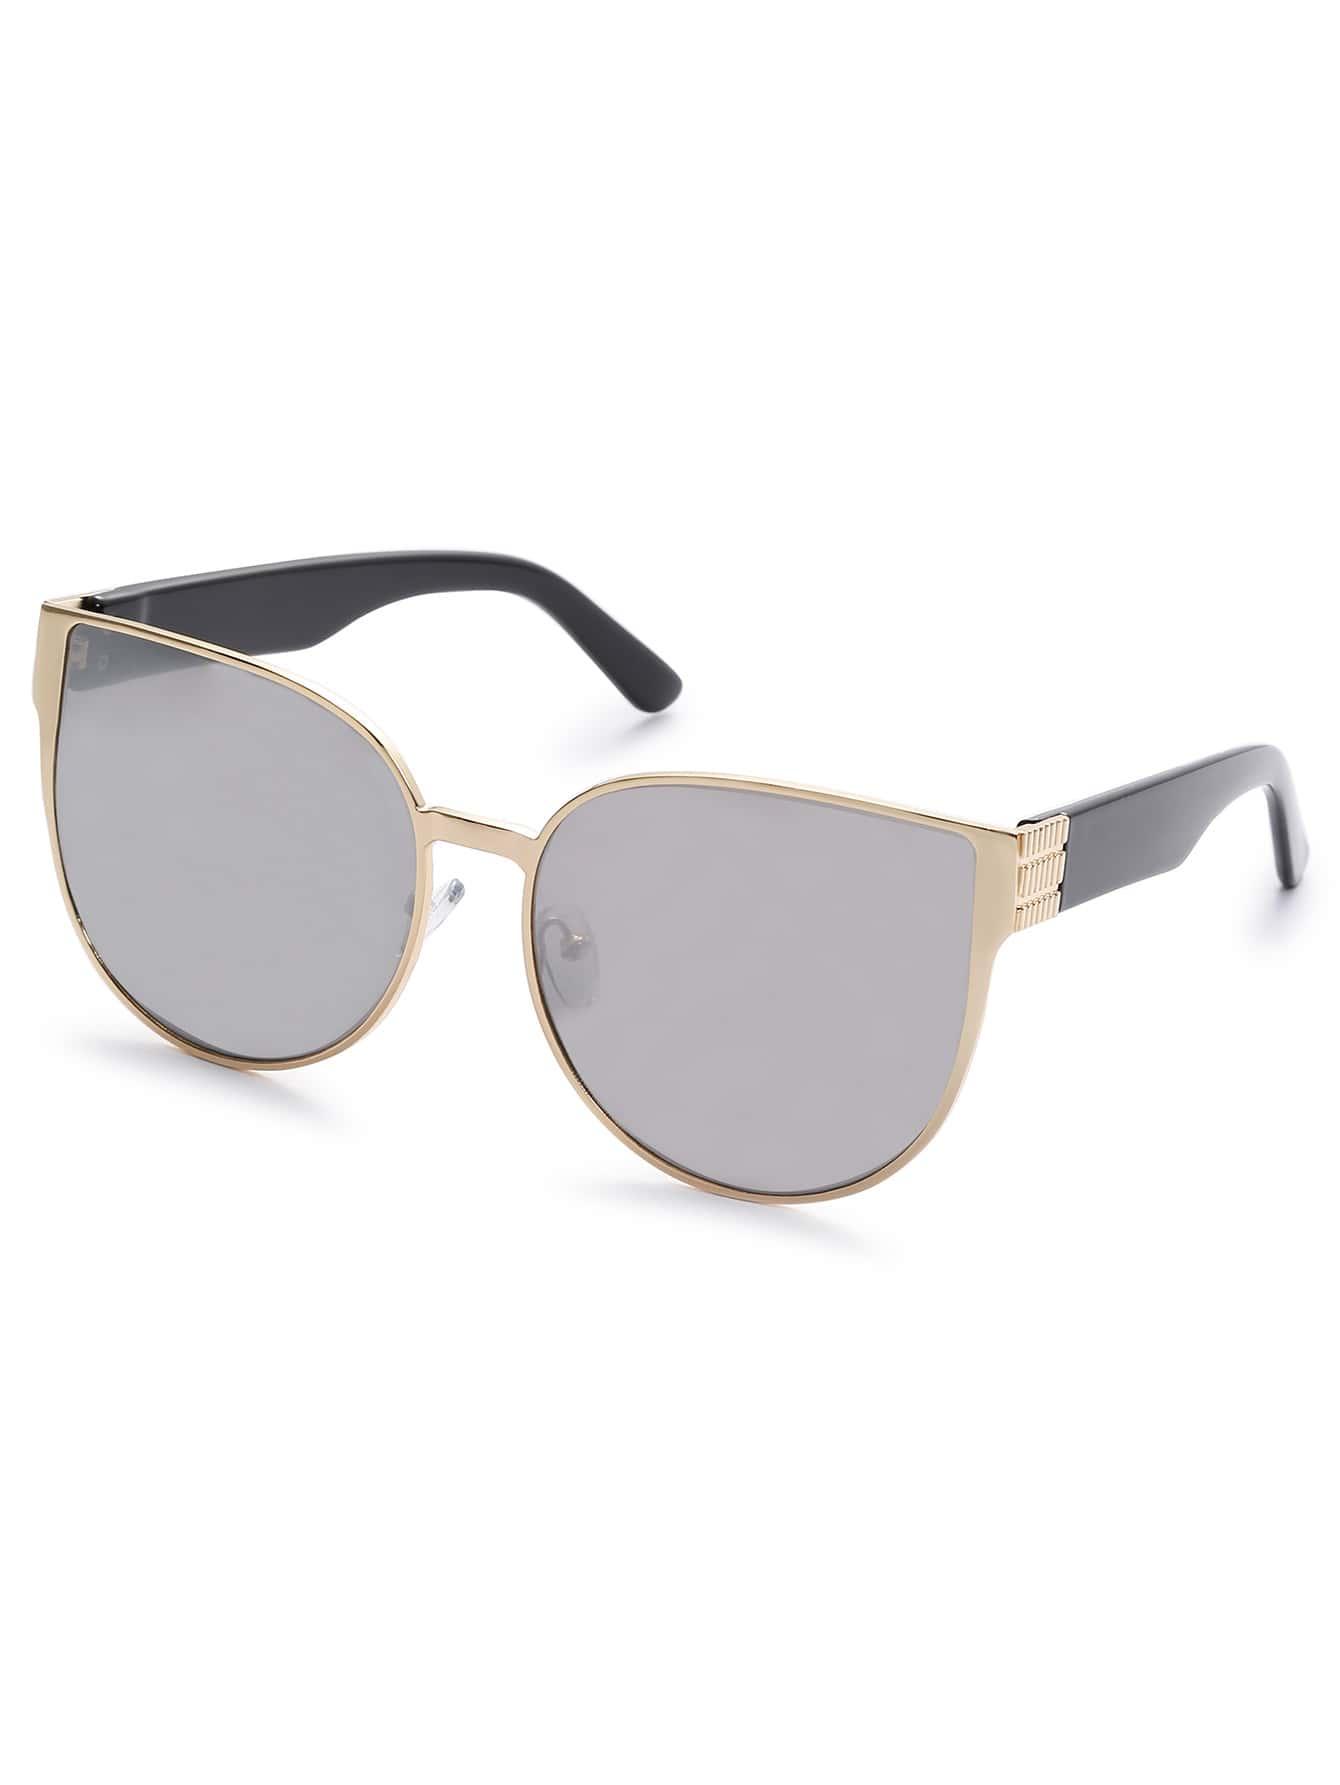 Gold Frame Cat Eye Sunglasses : Gold Metal Frame Grey Vintage Cat Eye Sunglasses